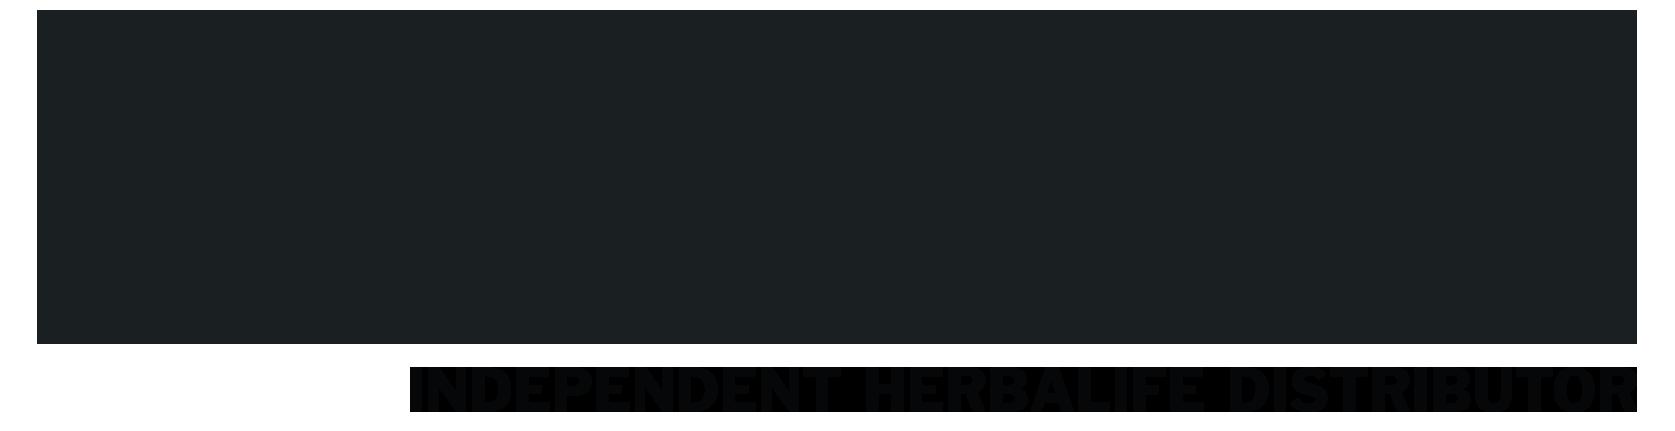 High Resolution Herbalife Nutrition Logo - News and Health - Herbalife 24 Logo